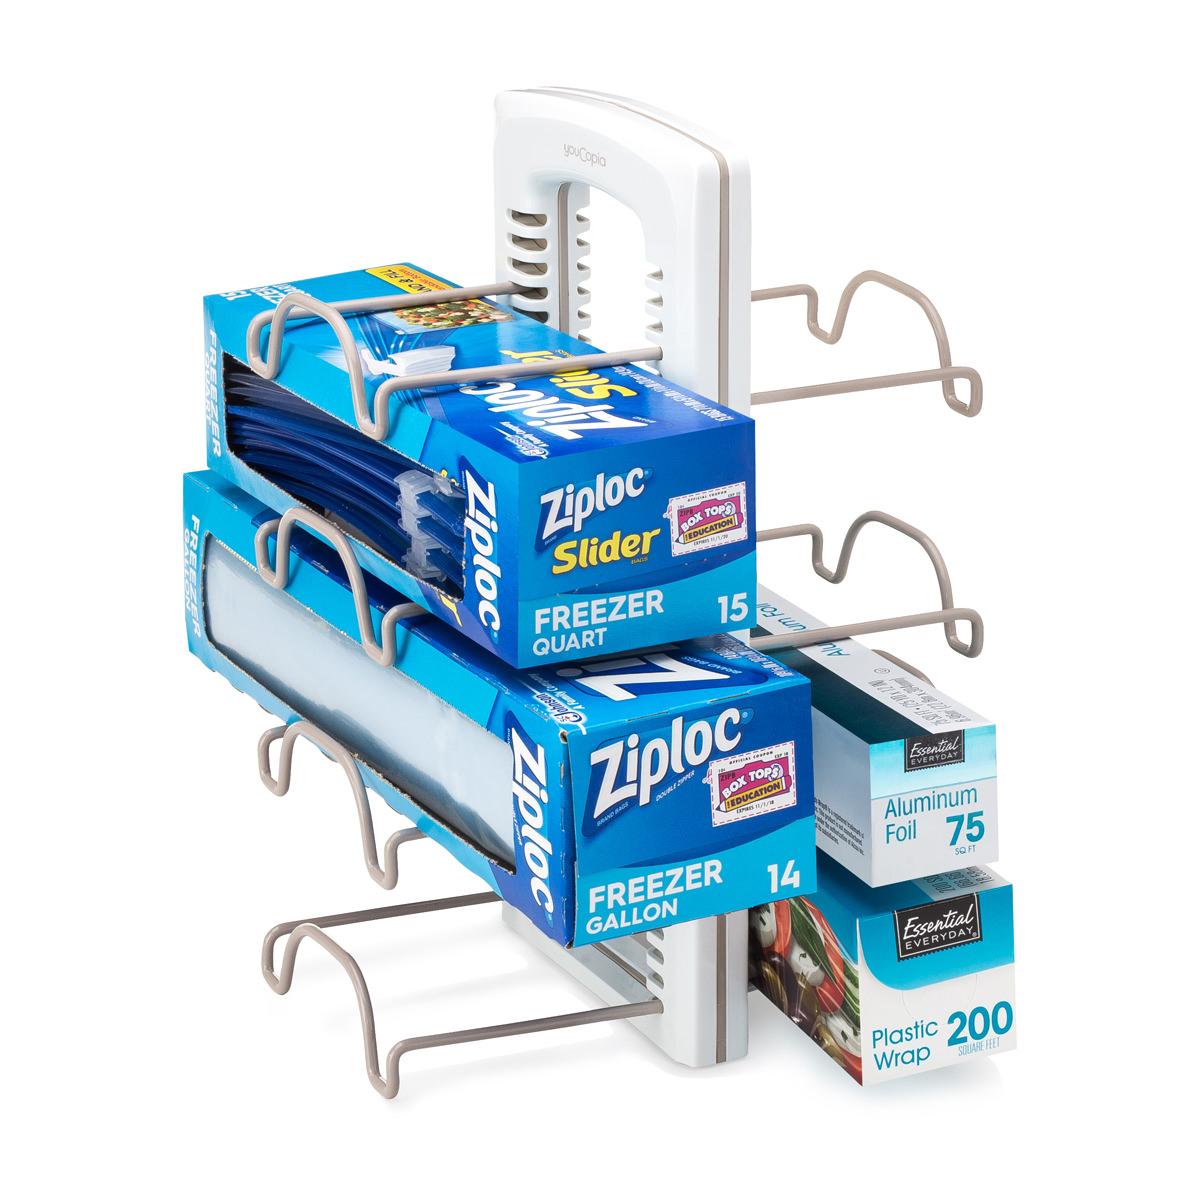 Ziplock and aluminum foil in a rack